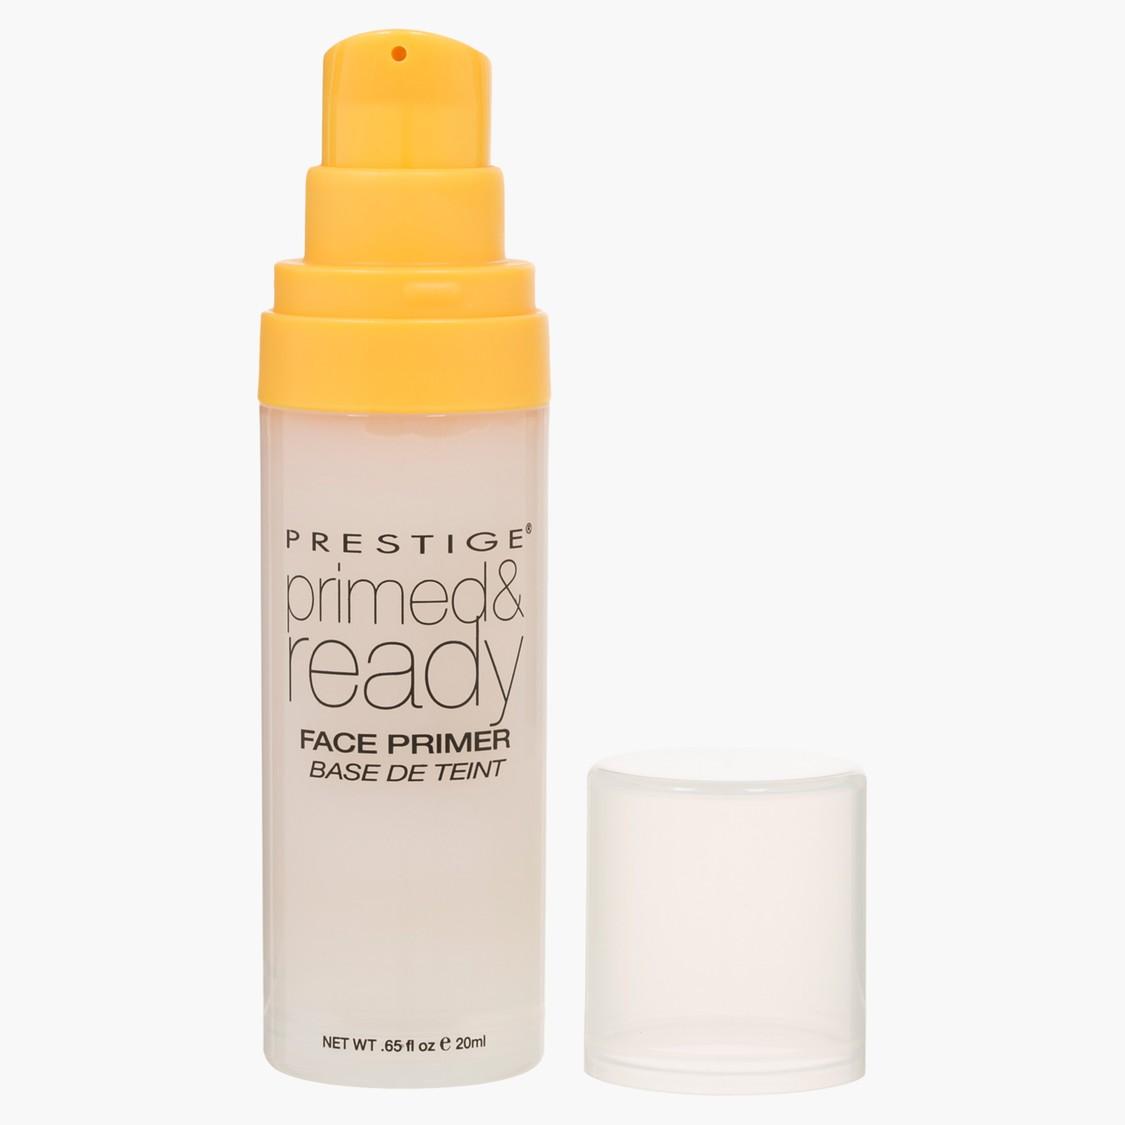 Prestige Primed and Ready Face Primer